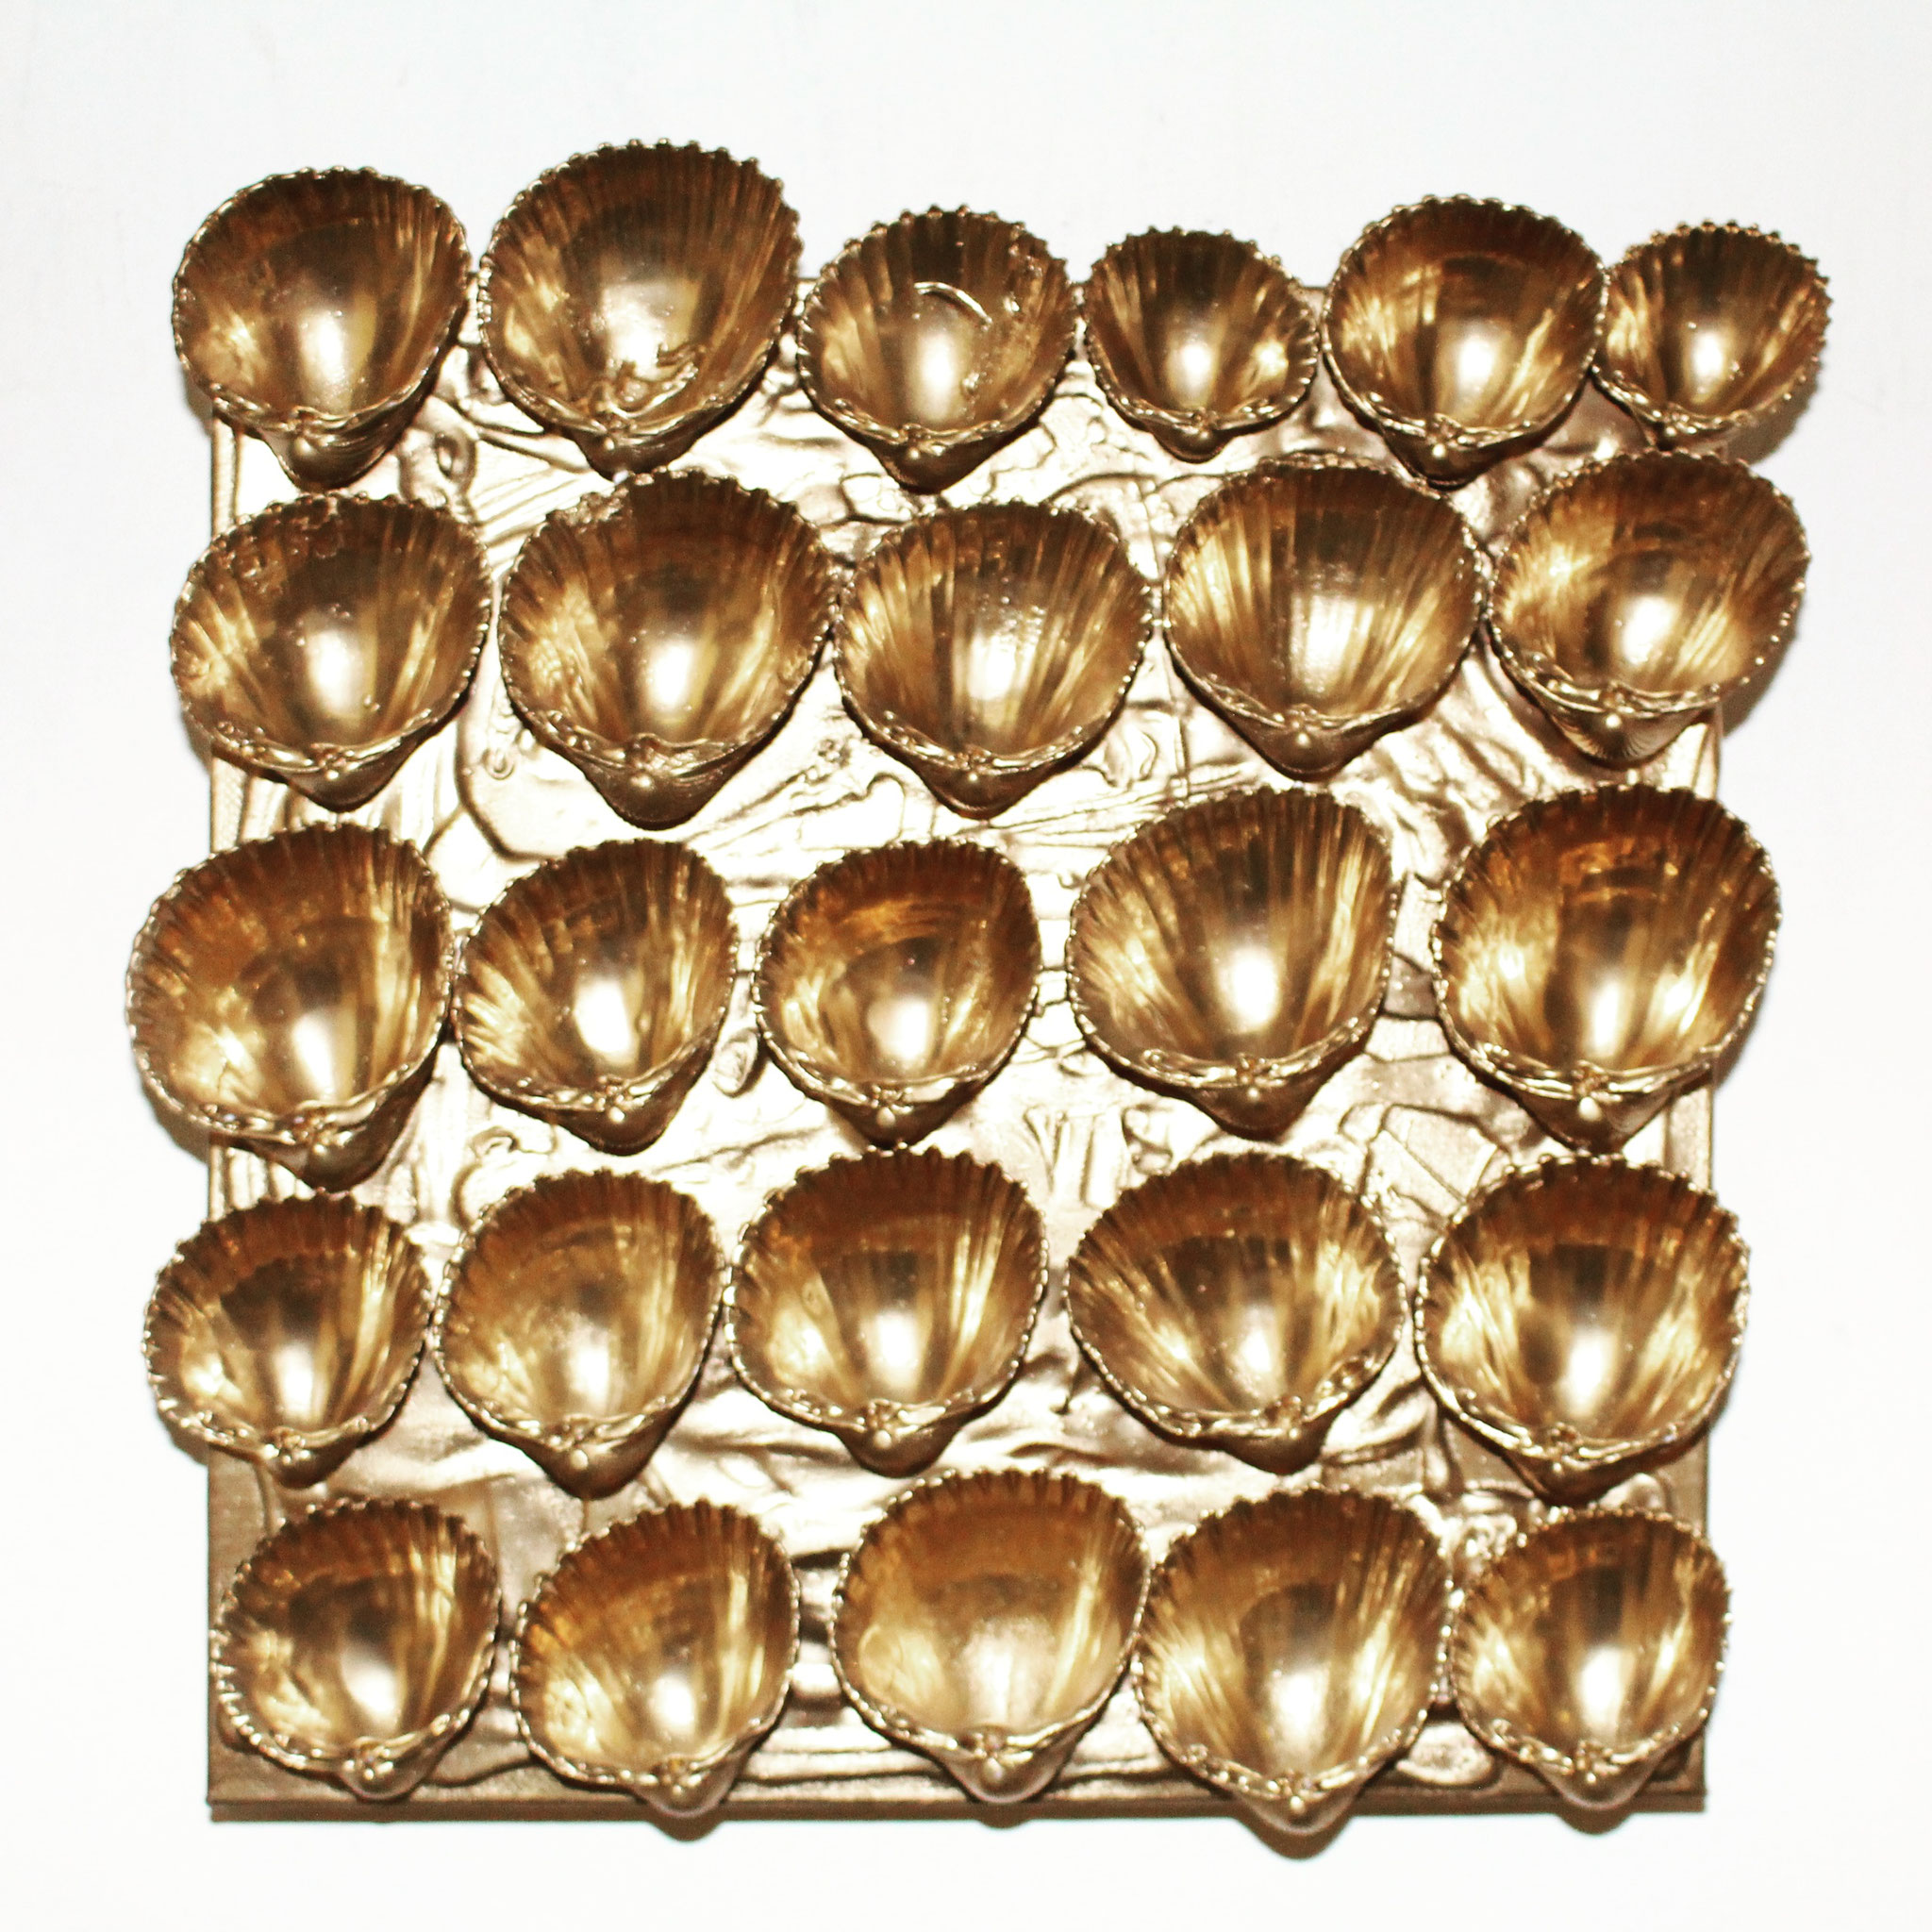 58.'' Golden seeashells.'' (30x30cm) spraypaint